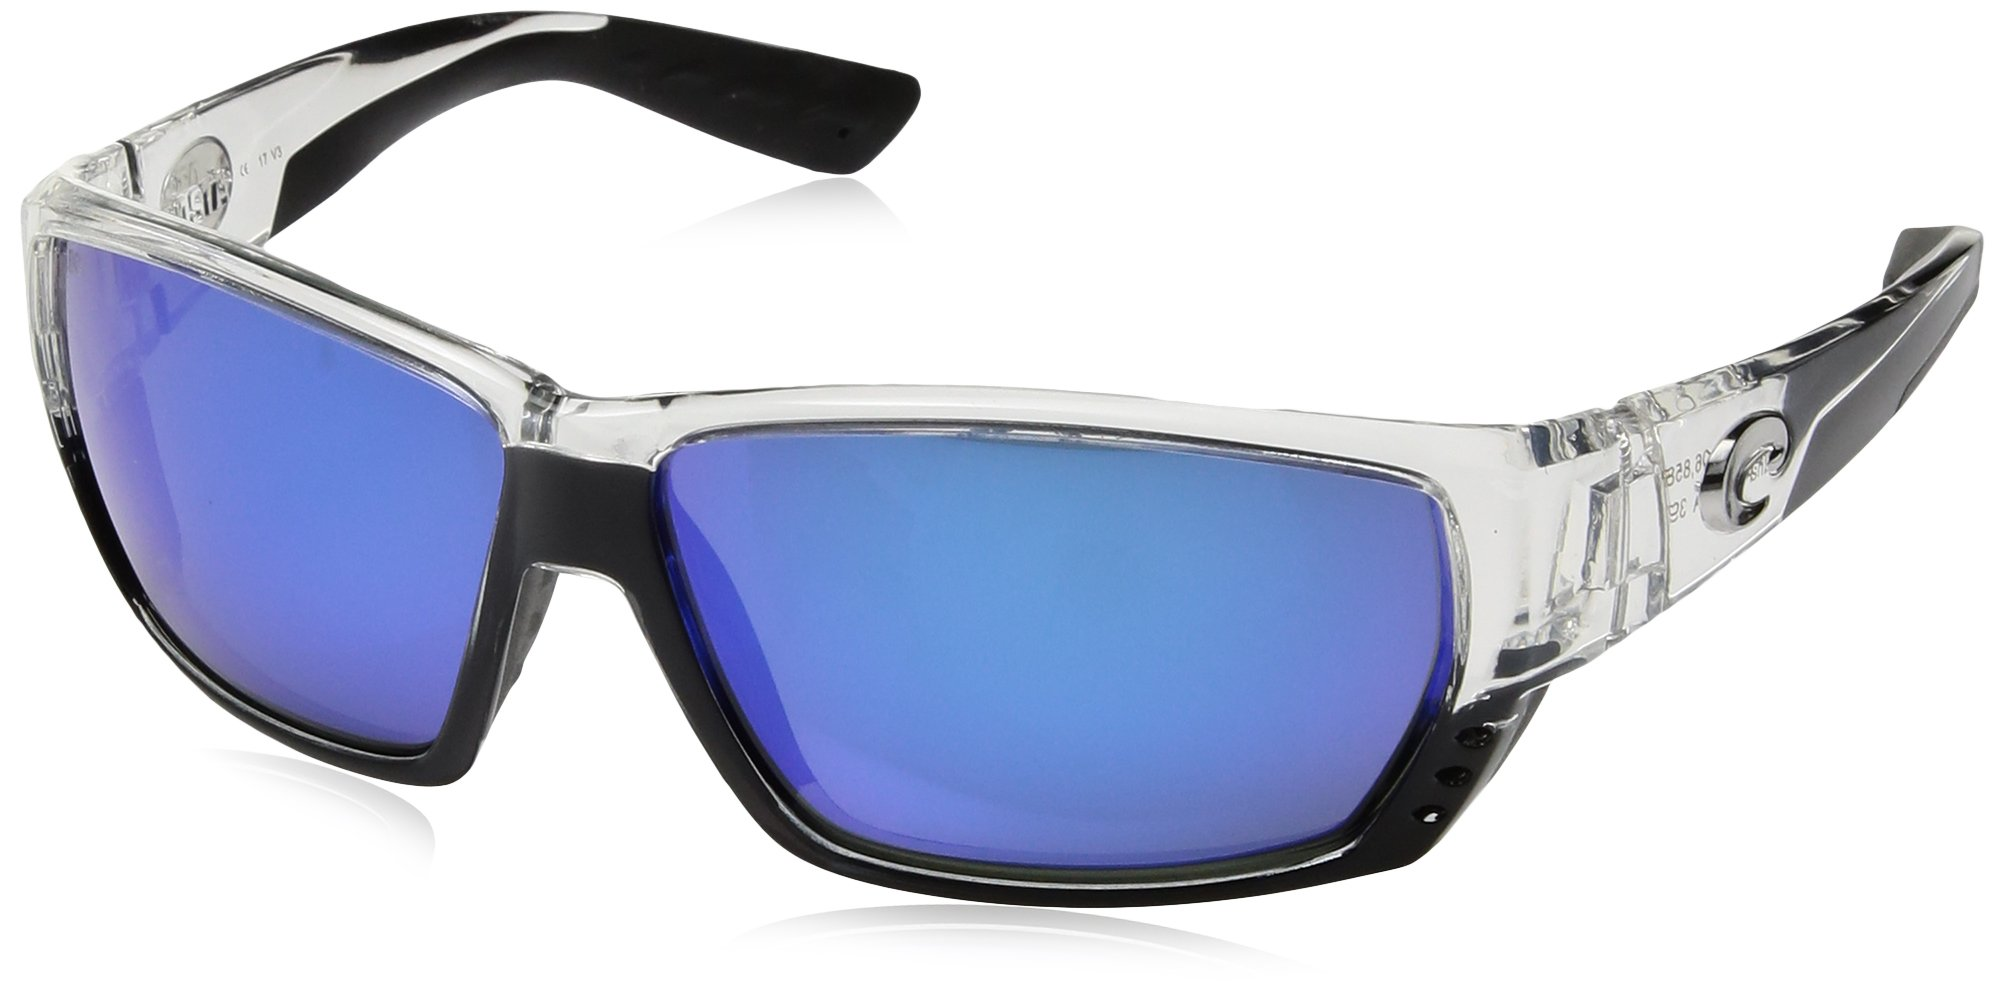 Costa del Mar Unisex-Adult Tuna Alley TA 25 OBMGLP Polarized Iridium Wrap Sunglasses by Costa Del Mar